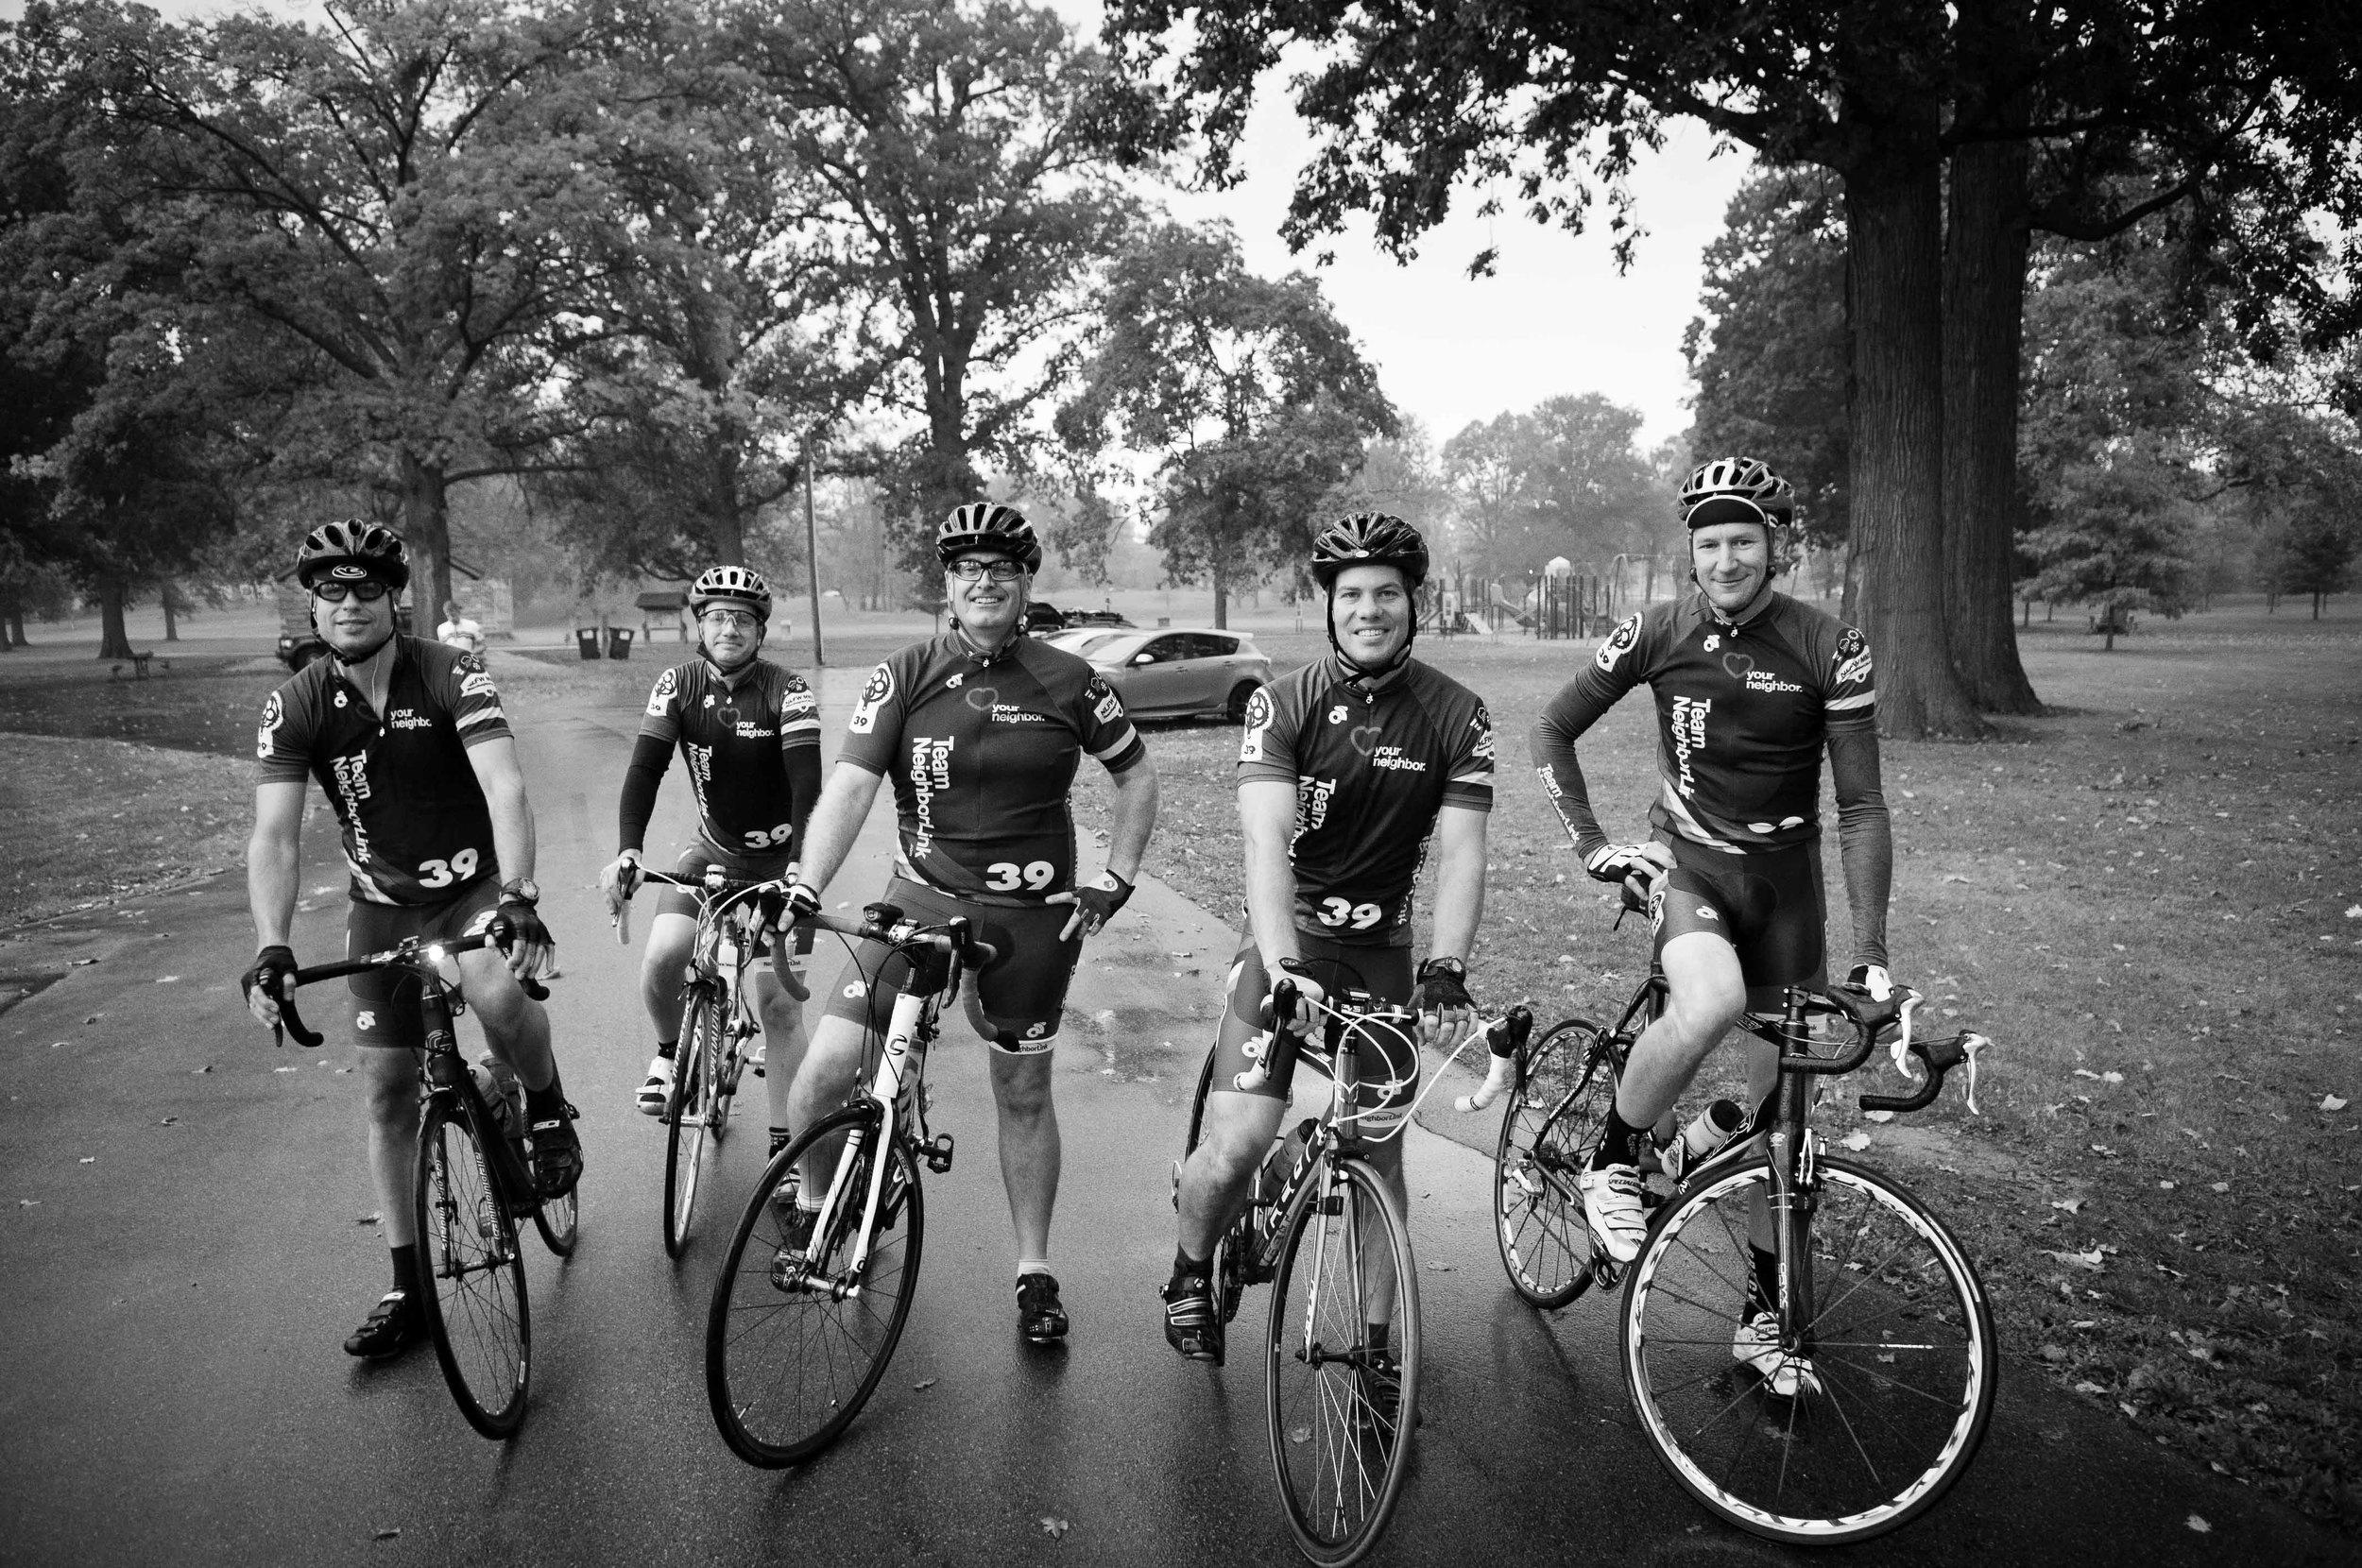 Team NeighborLink Riders. Joe, Paul, Jeff, Ty, and Ed.